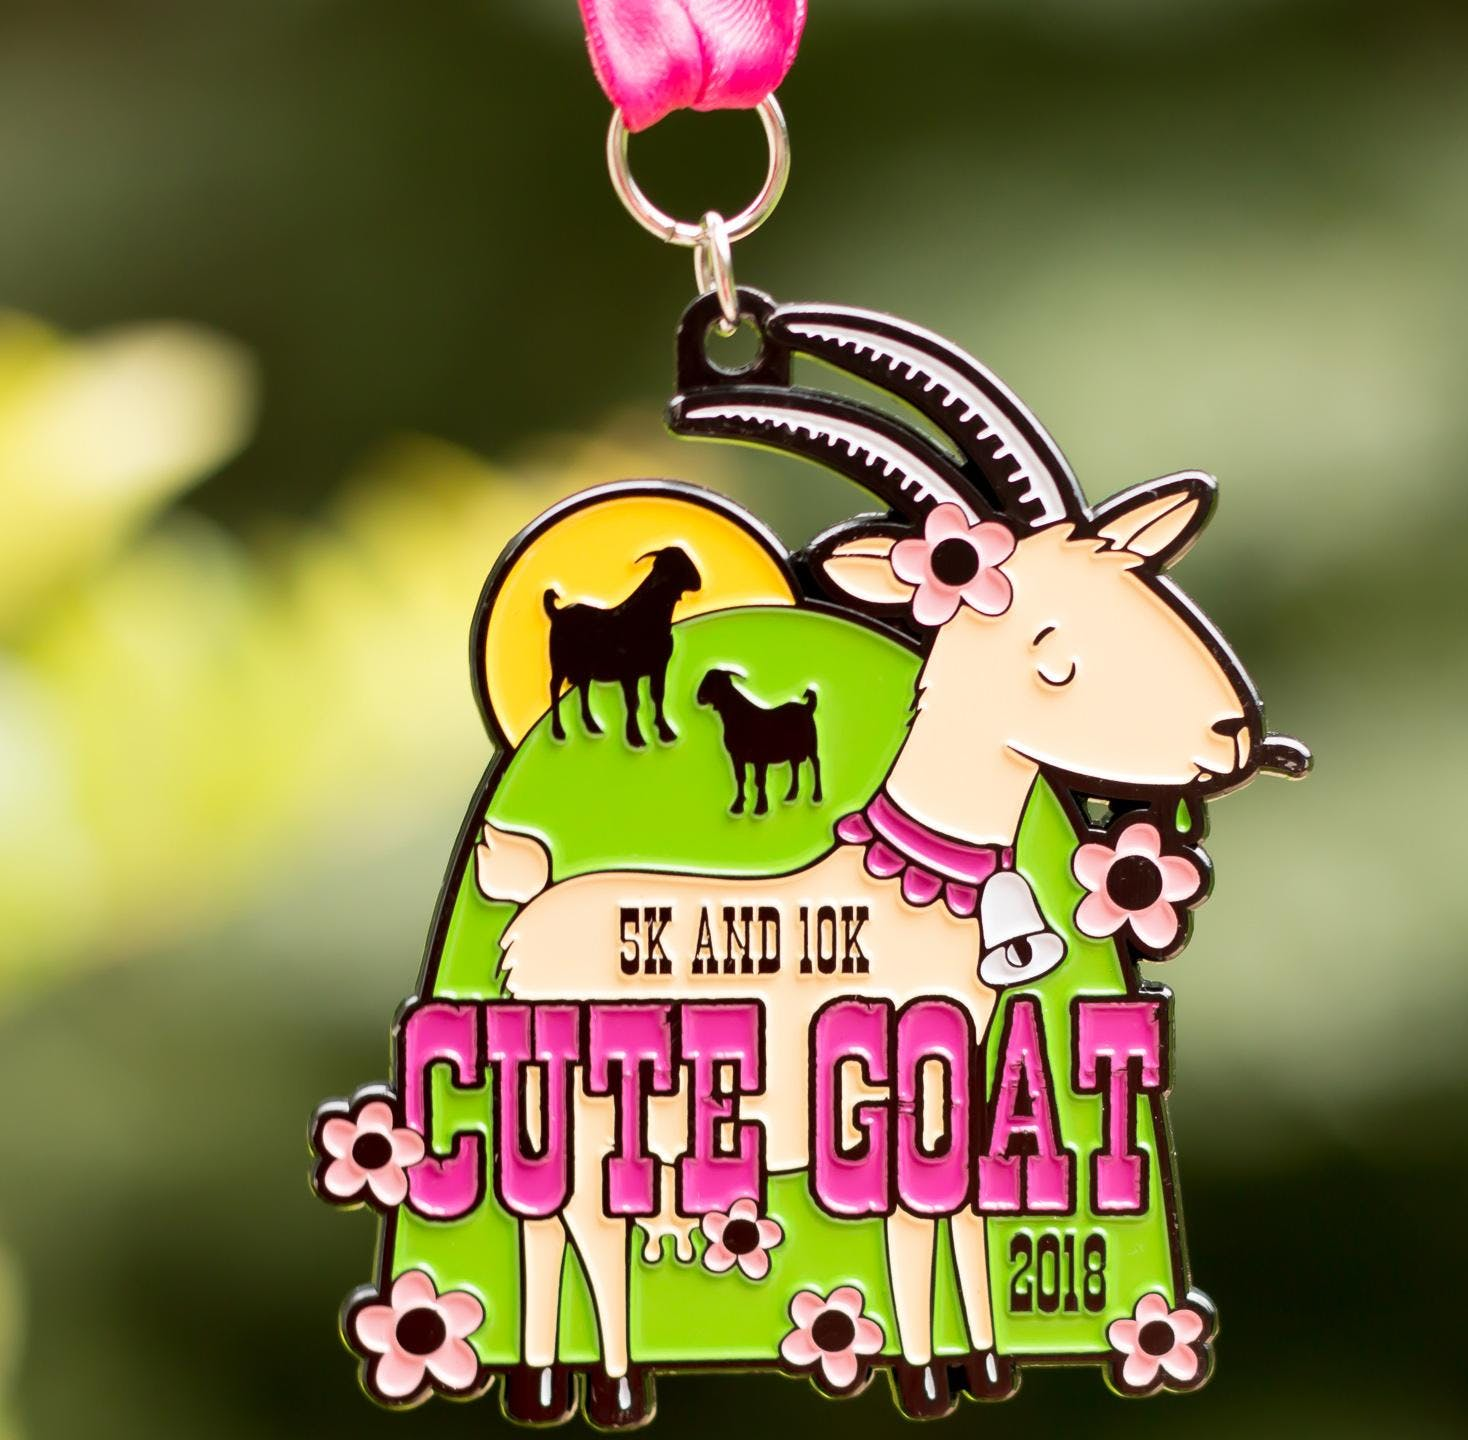 Now Only $10! Cute Goat 5K & 10K - Austin